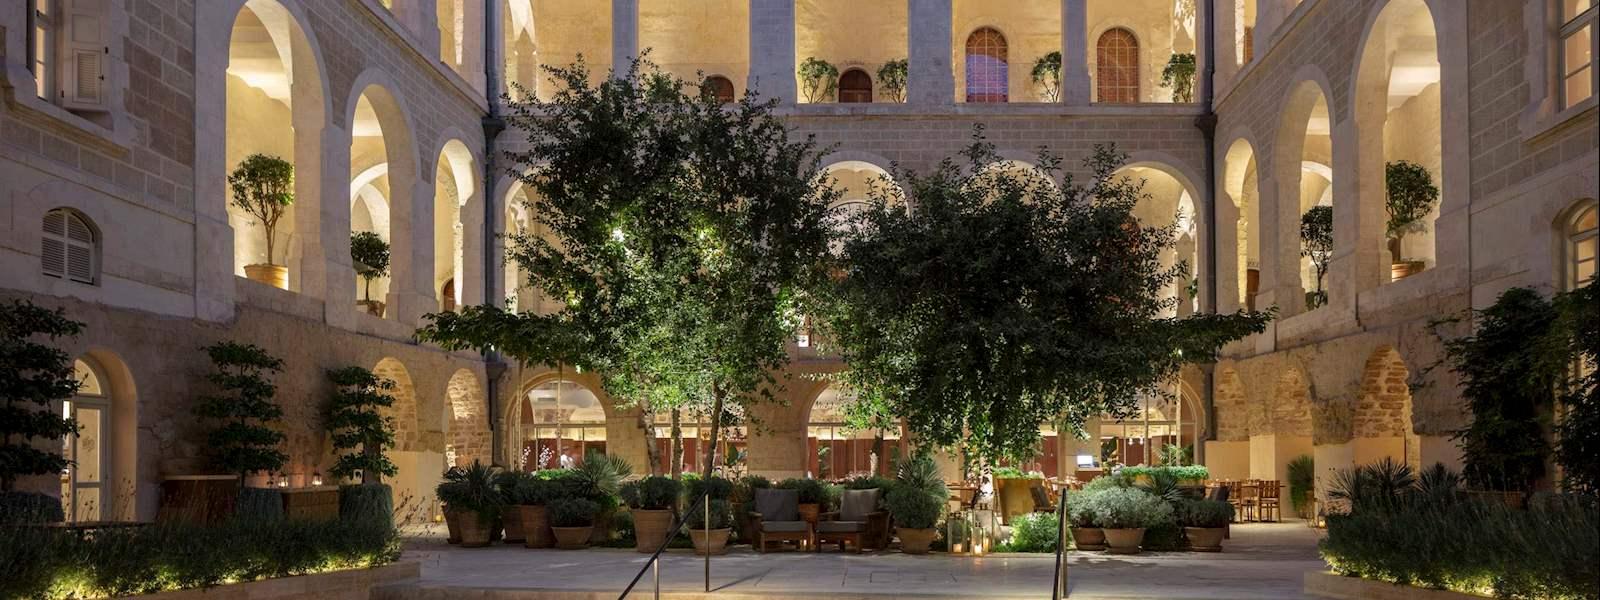 The Jaffa, A Luxury Collection Hotel, Tel Avi